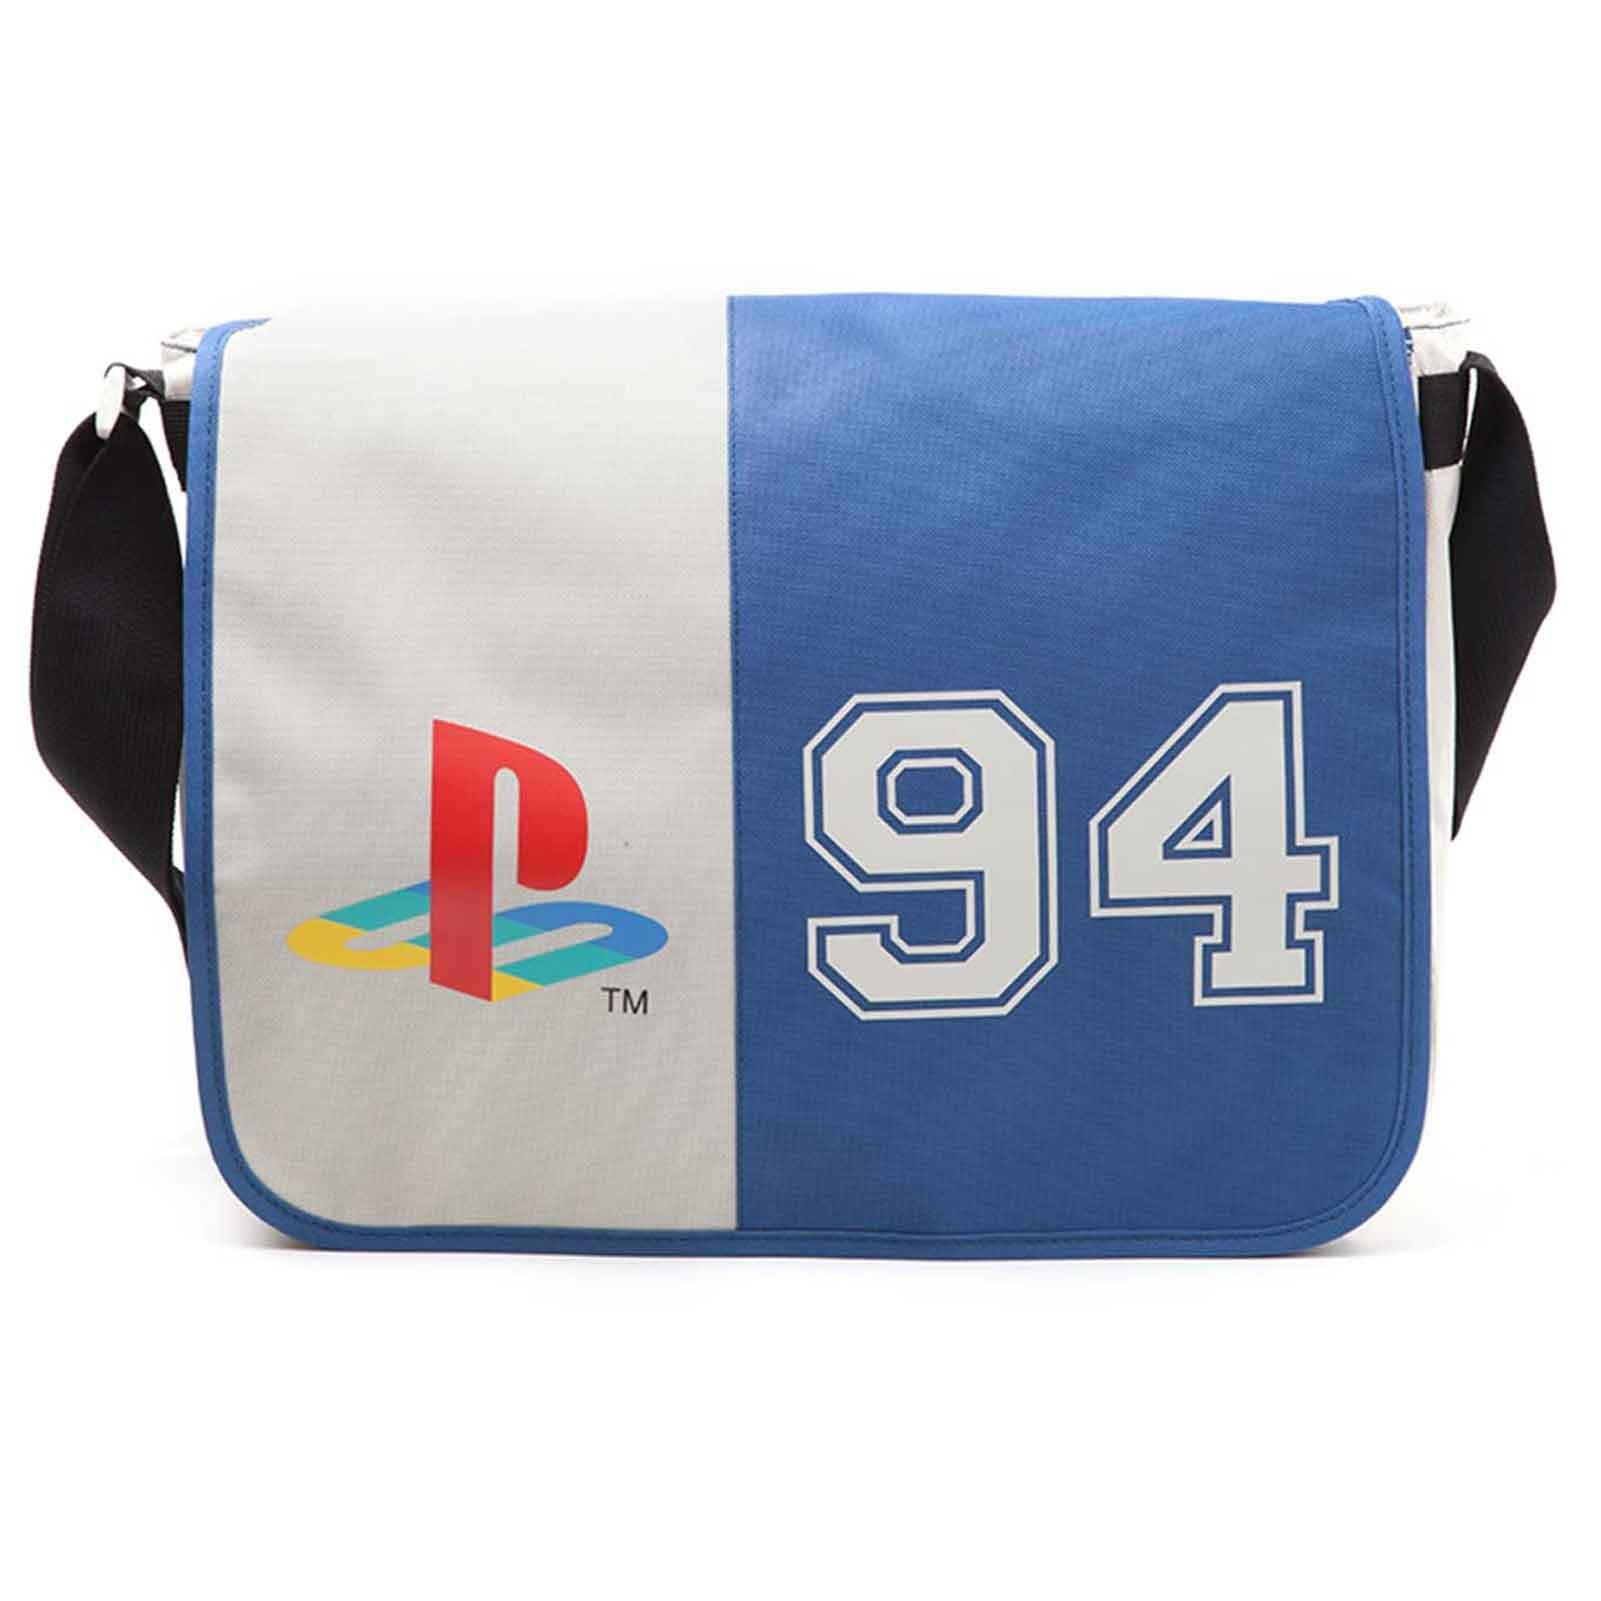 Playstation Messenger Bag Classic 94 Buttons Logo Official Gamer